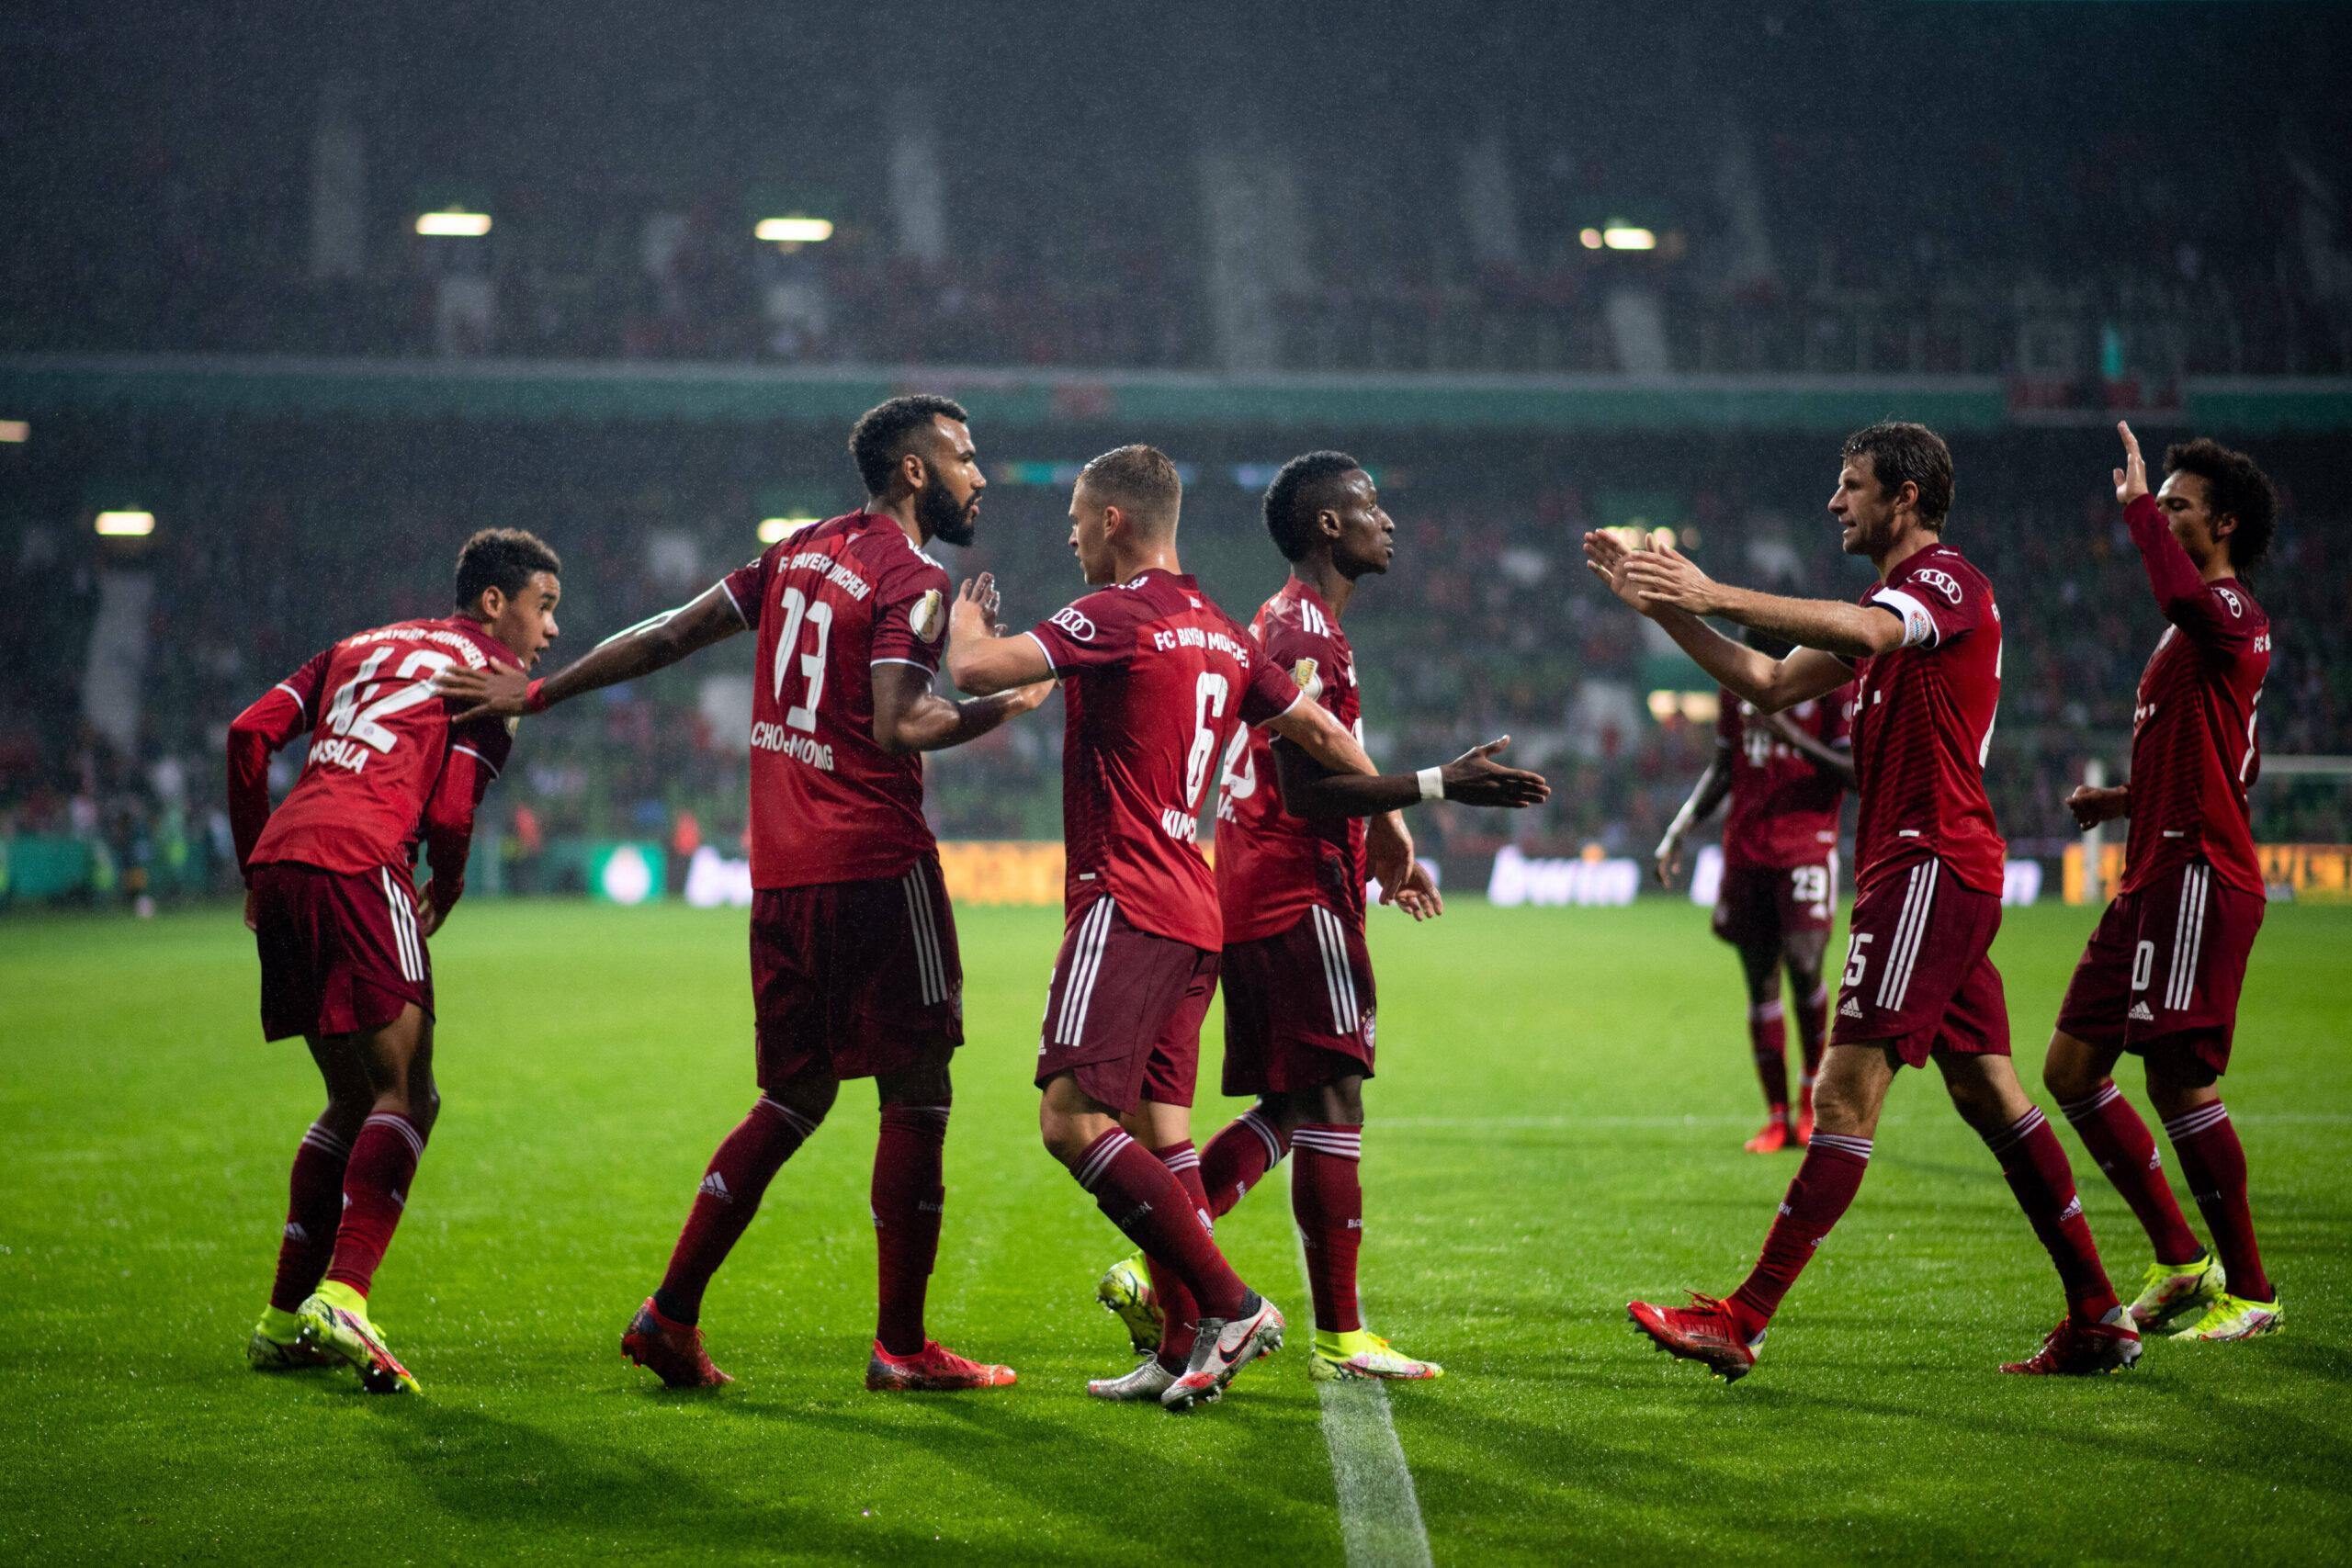 FC Bayern pasa sin despeinarse a la segunda ronda de DFB Pokal. Foto: Imago